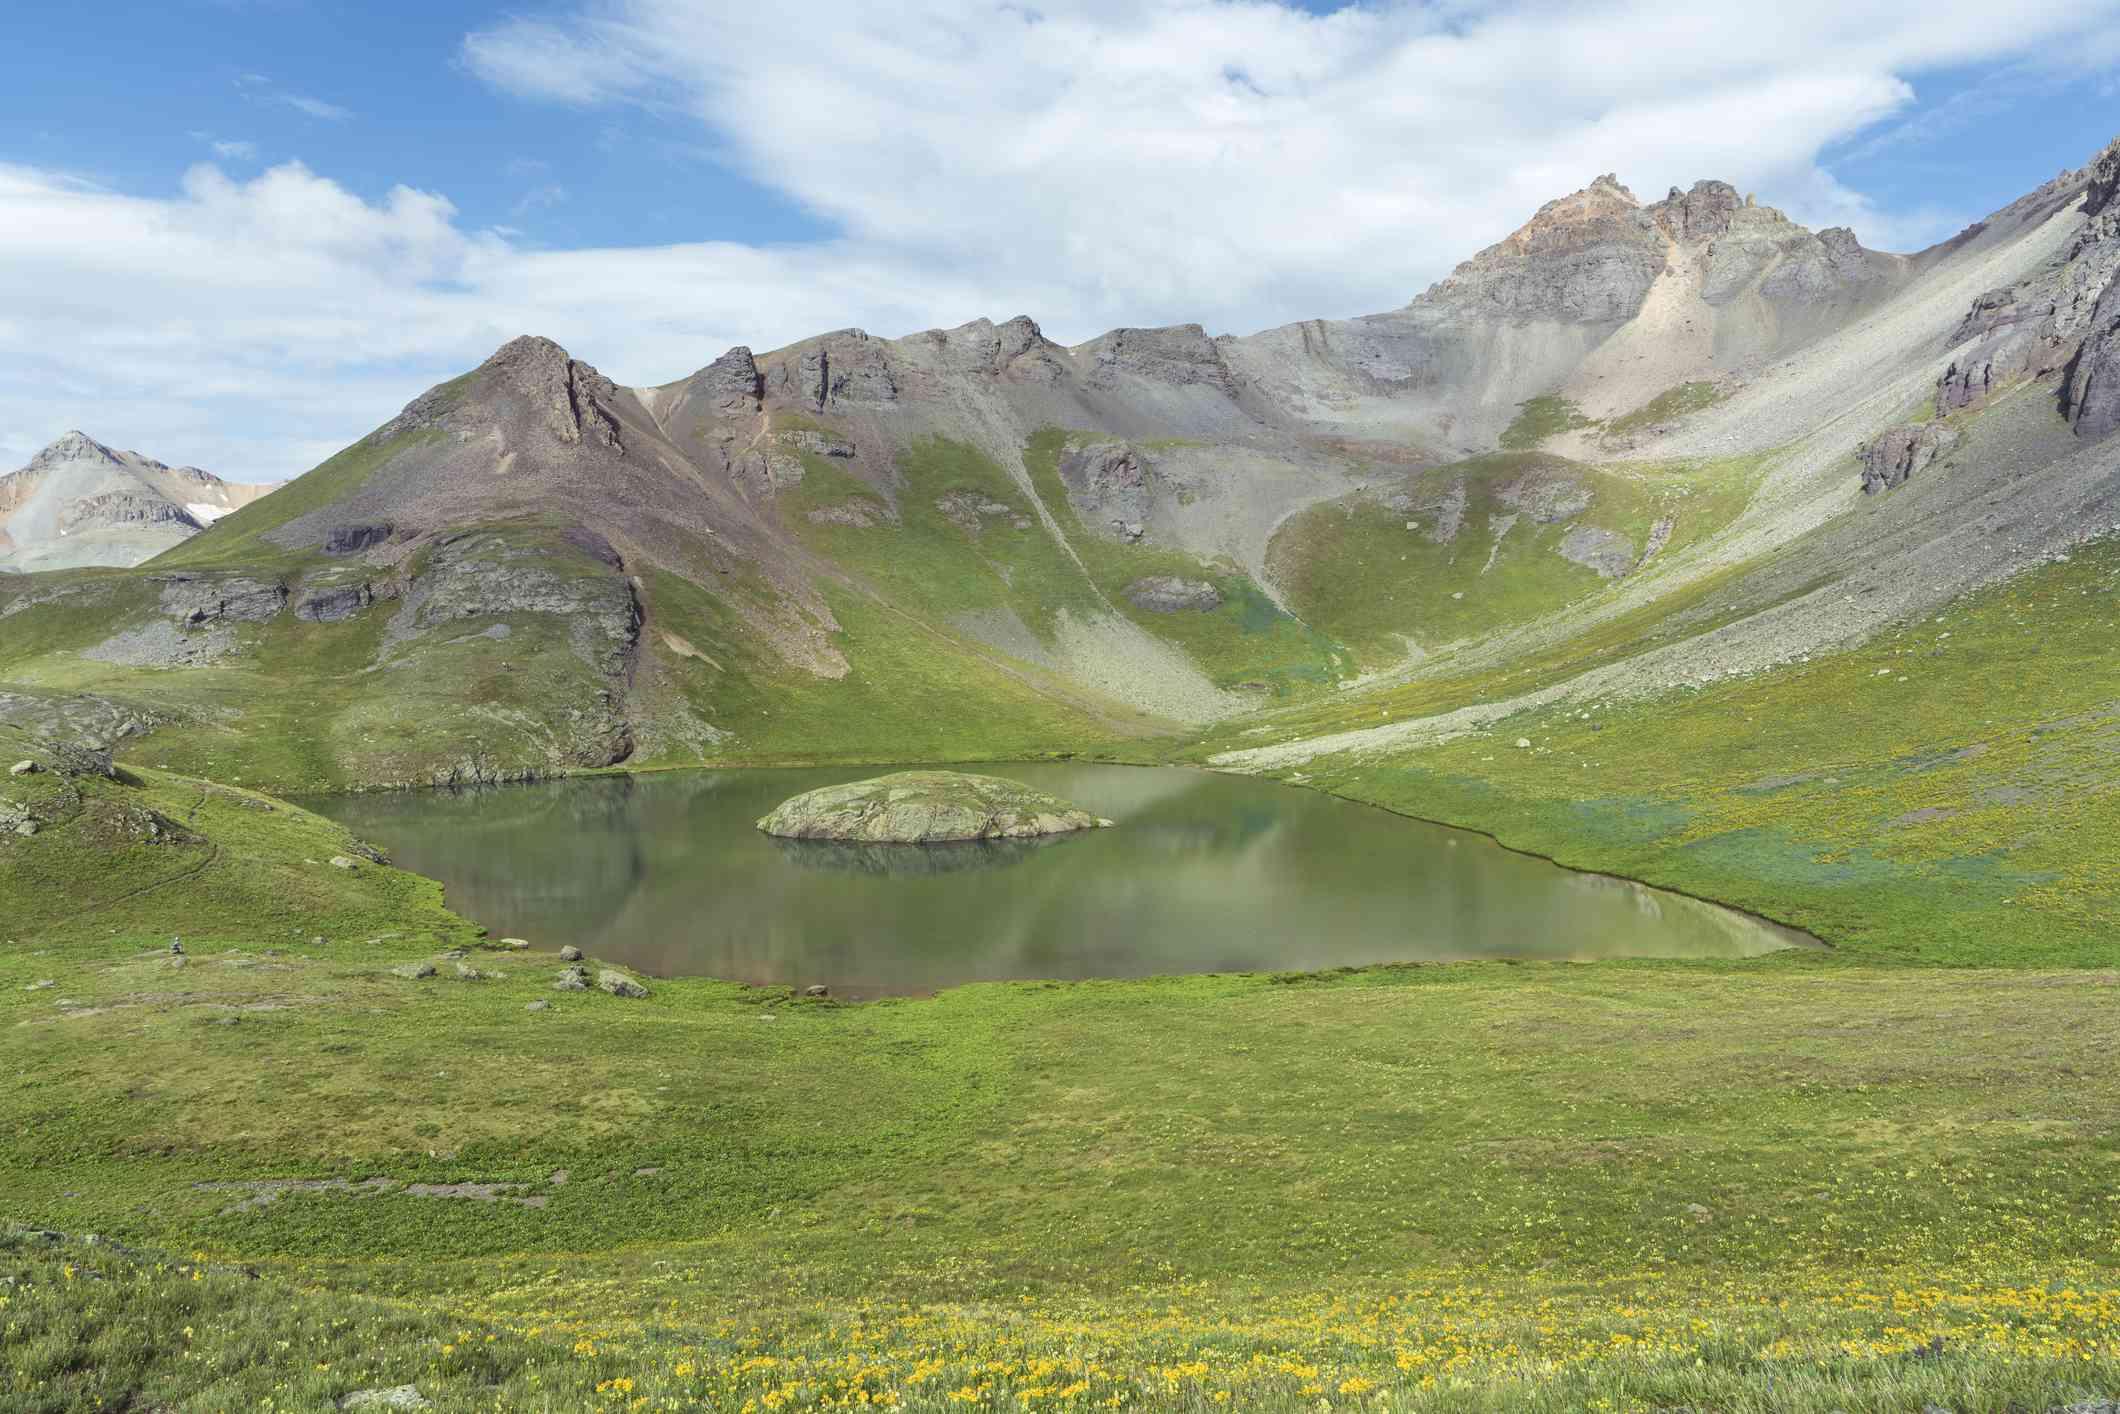 Ice Lakes Basin, Colorado